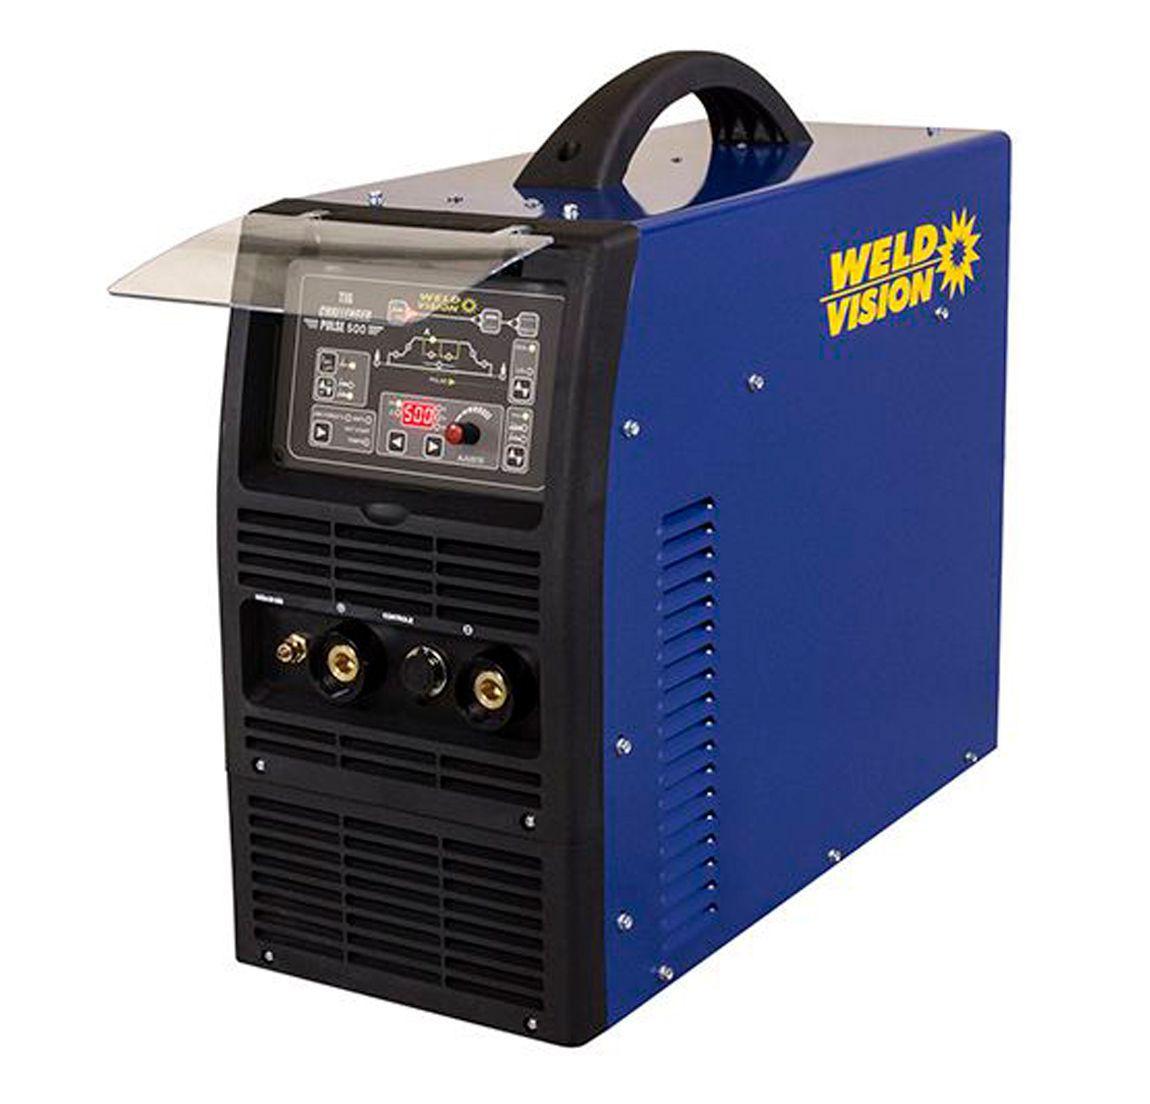 Máquina de solda inversora TIG Challenger 500 Pulse Weld Vision